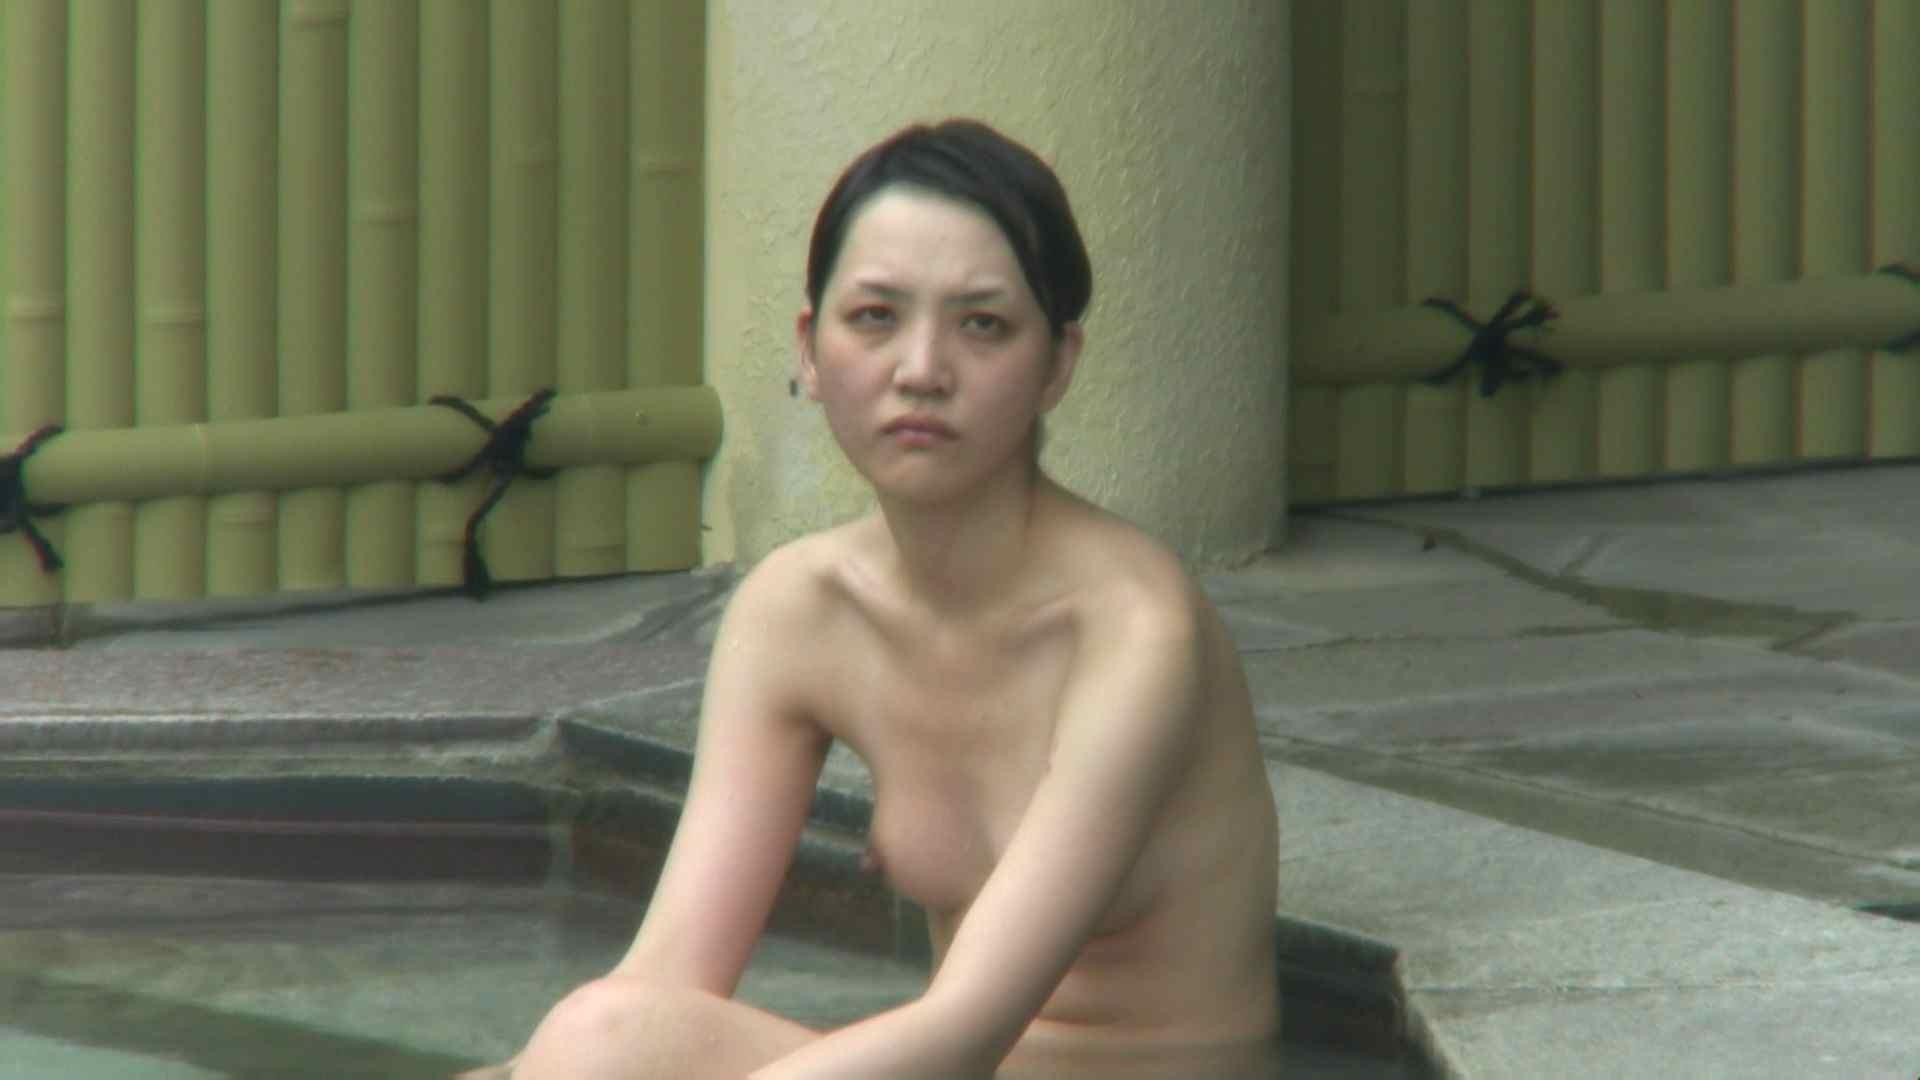 Aquaな露天風呂Vol.64【VIP限定】 露天風呂編  78PIX 12